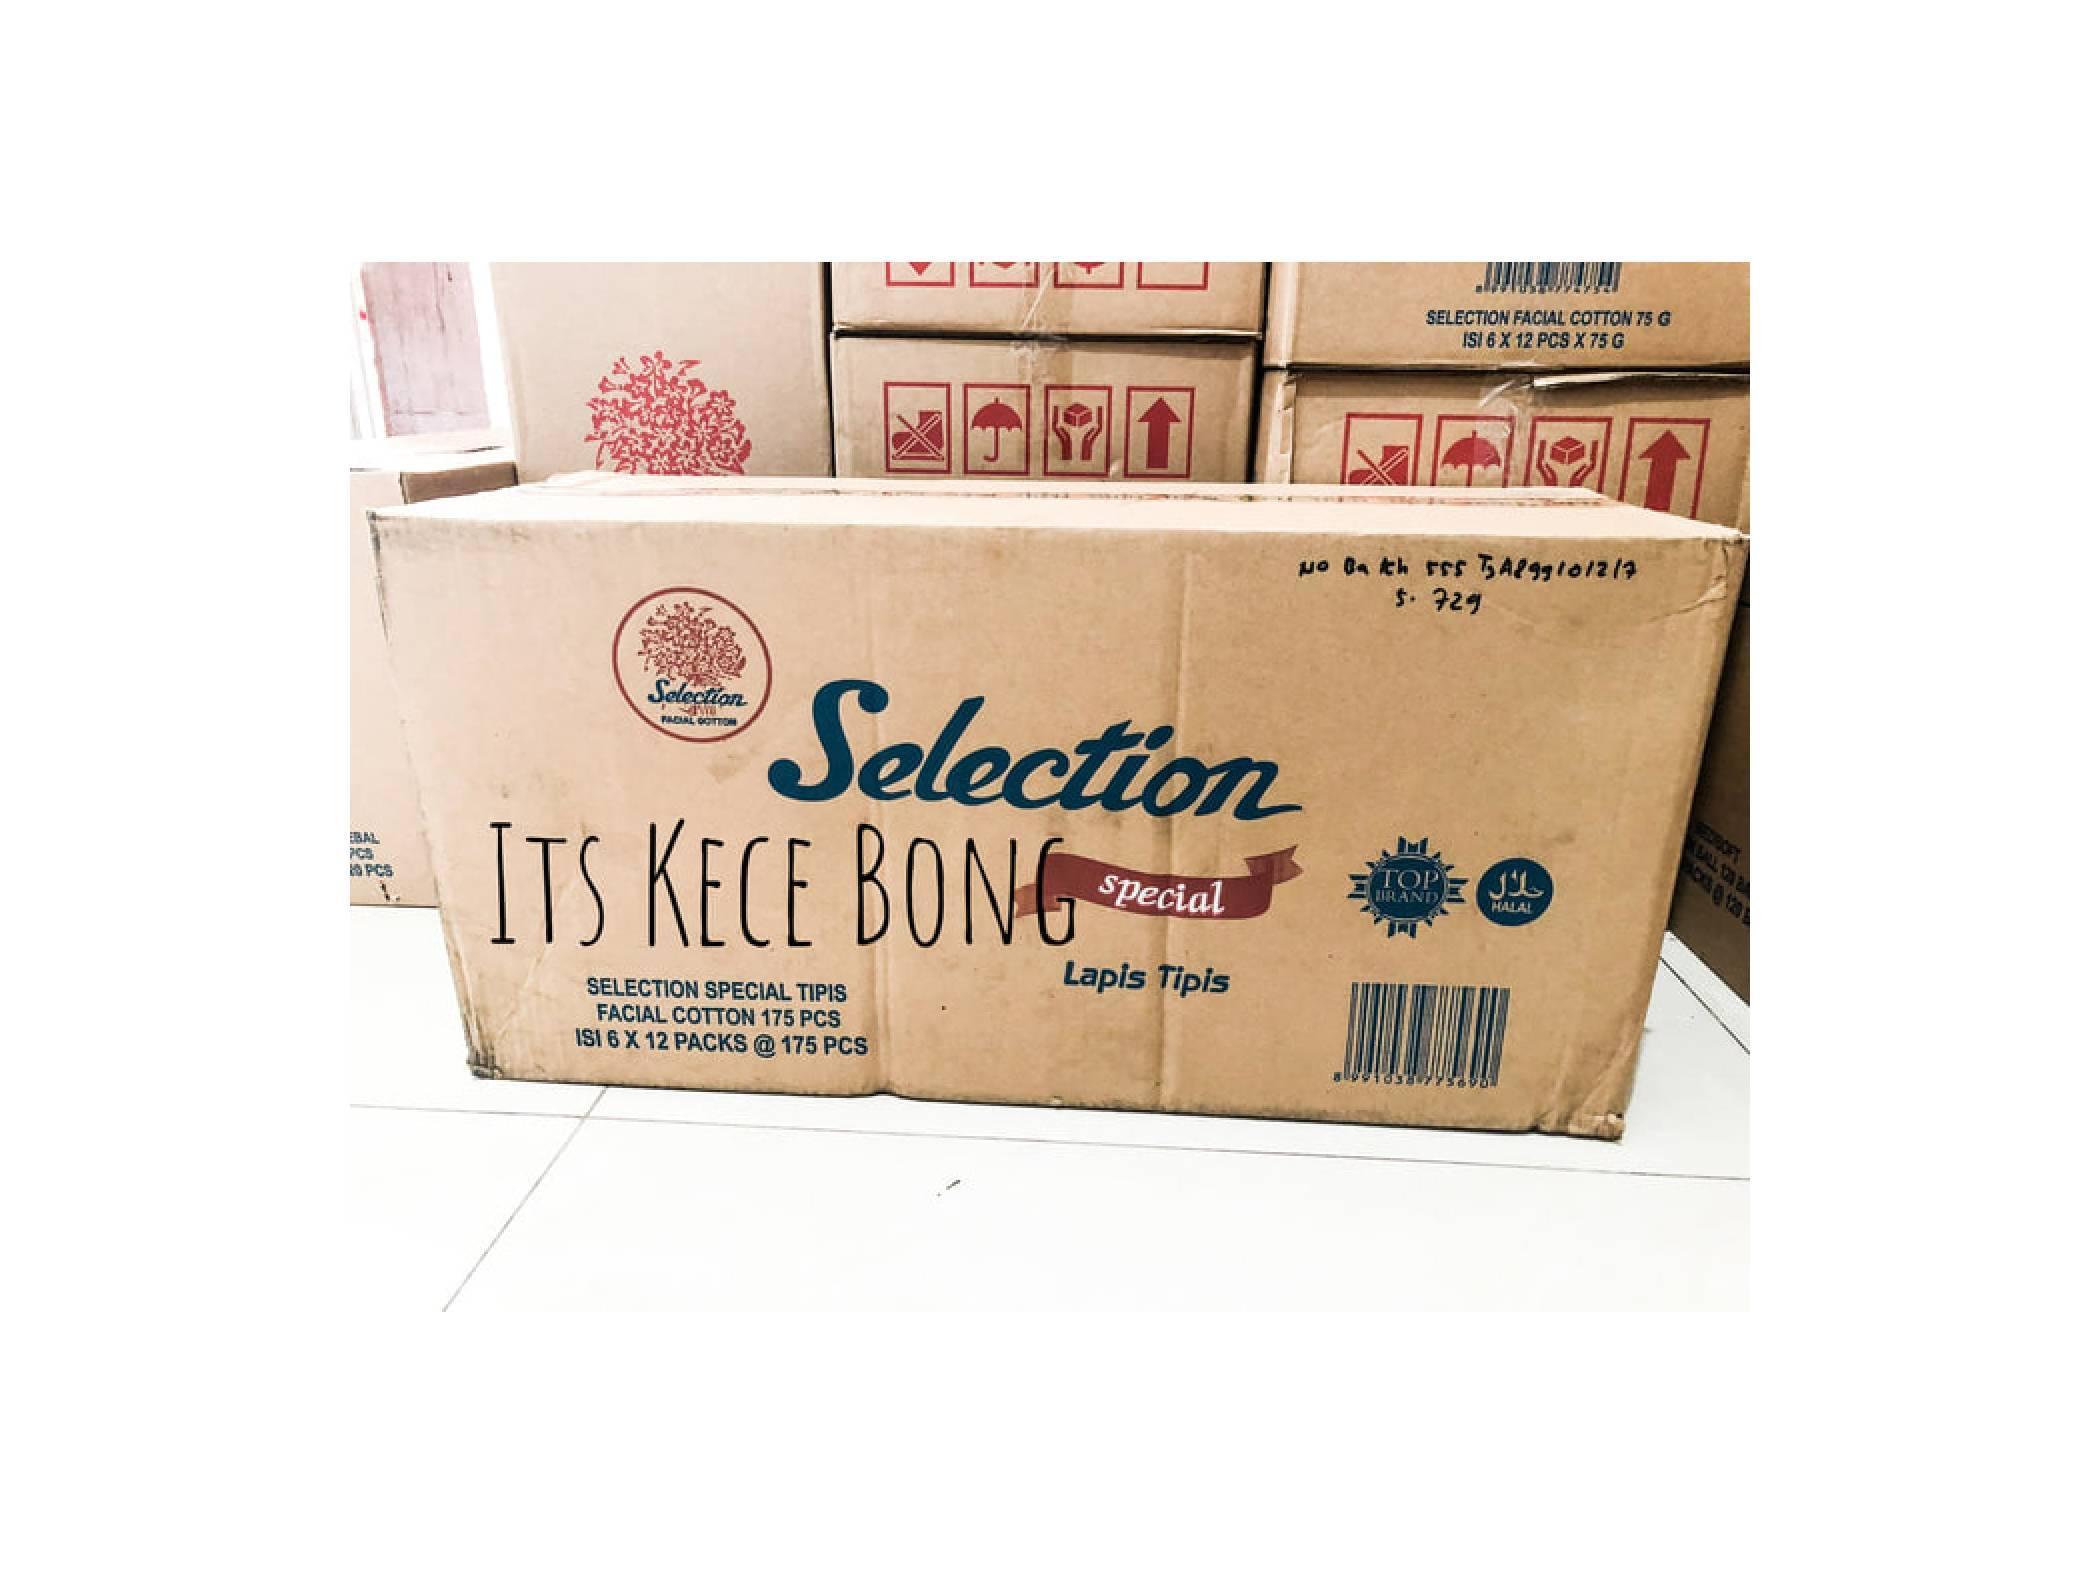 Selection Facial Cotton Kapas Wajah 75 Gram 6 Pcs Half Dozen Spec Kecantikan 35g Special Lapis Tipis Cottonidr1216000 Rp 1216000